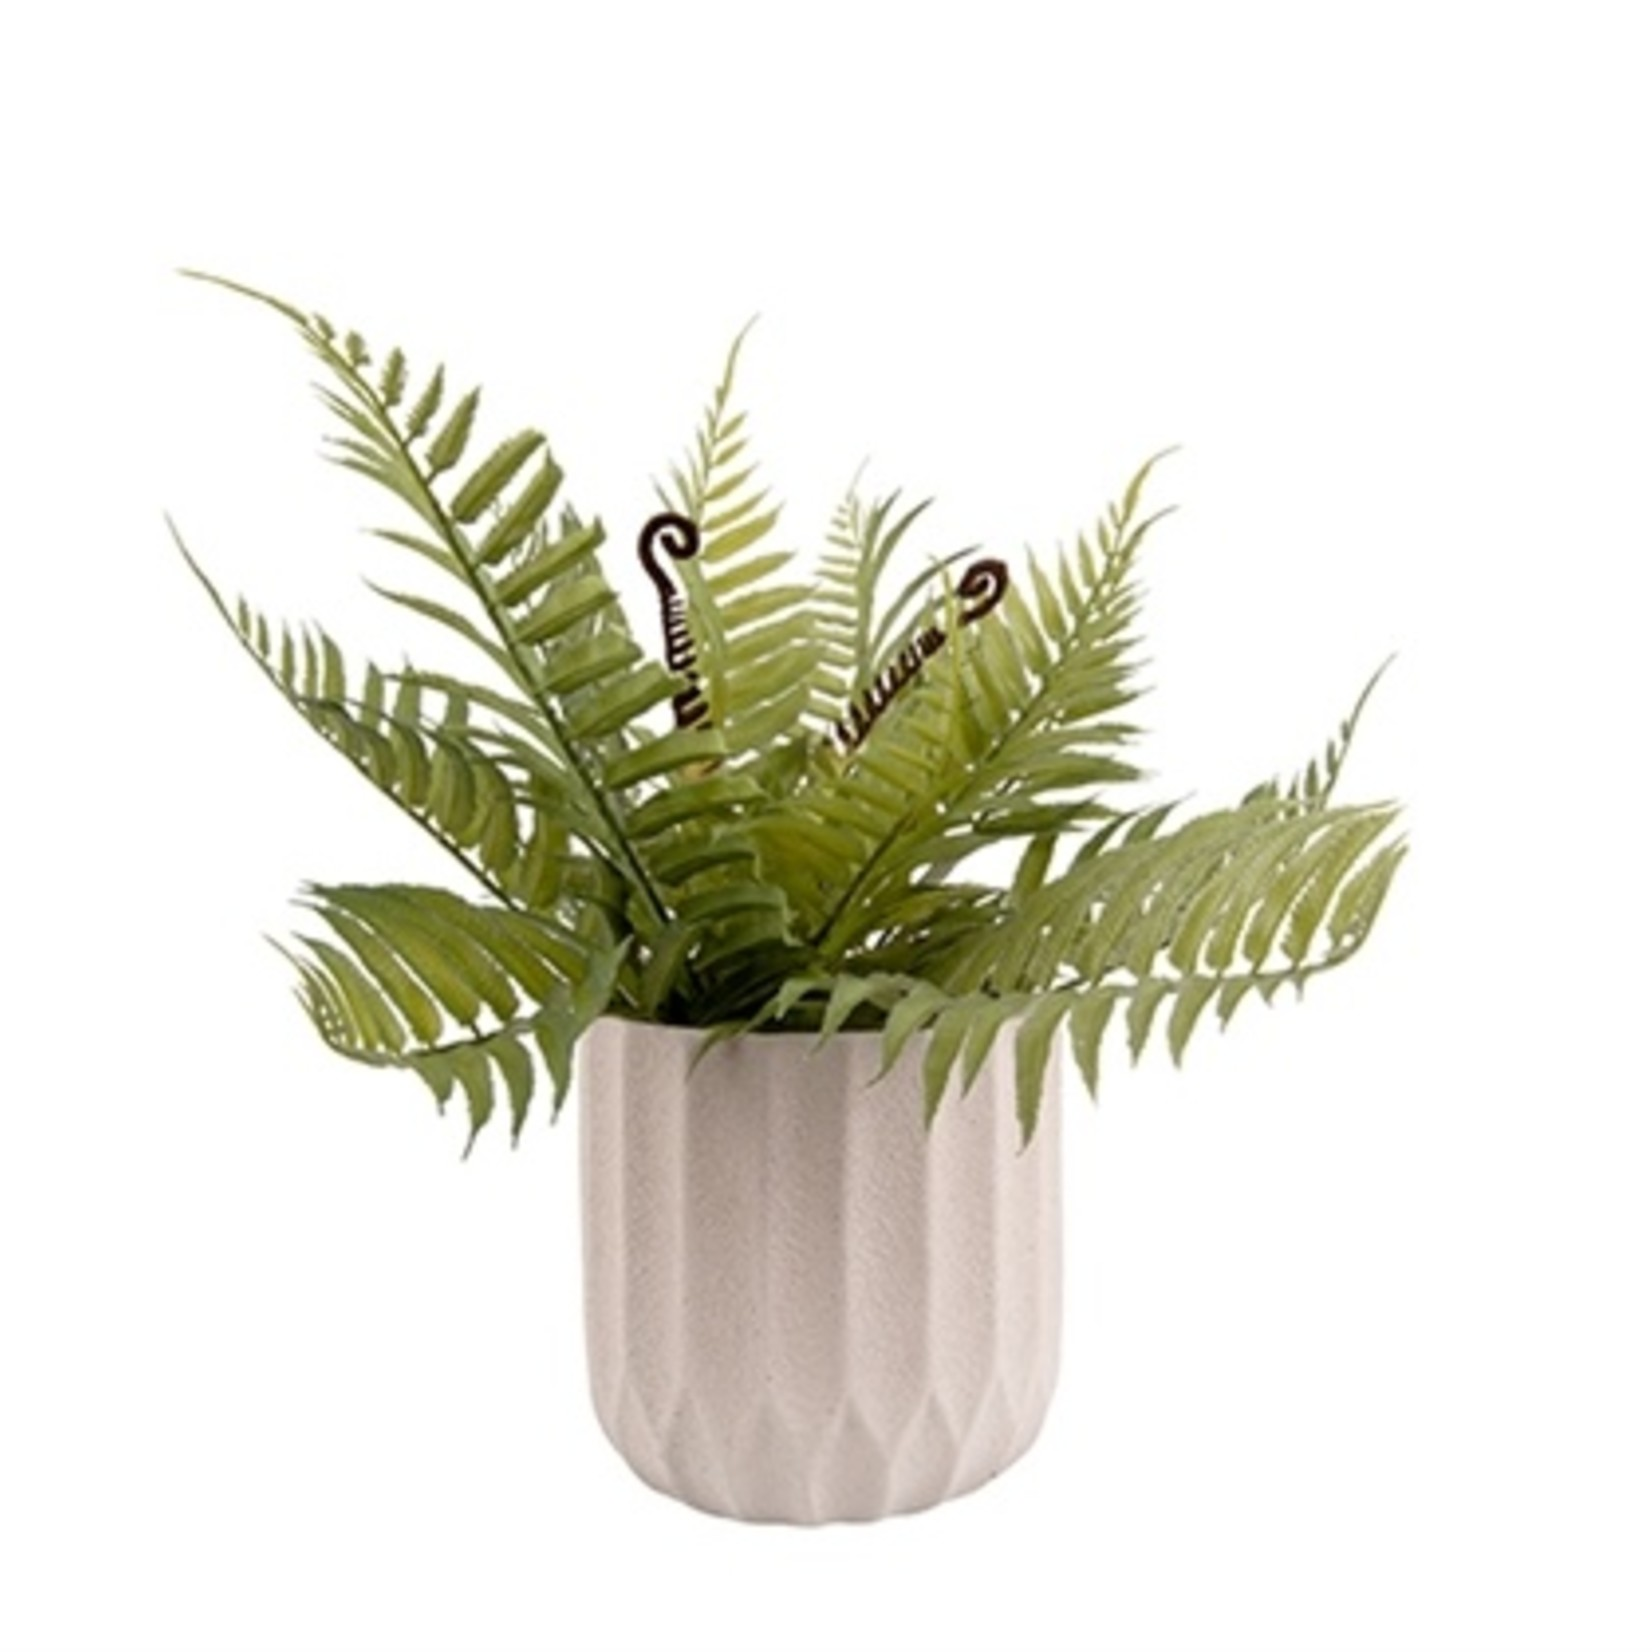 Presenttime Plant Pot Stripes Cement Medium